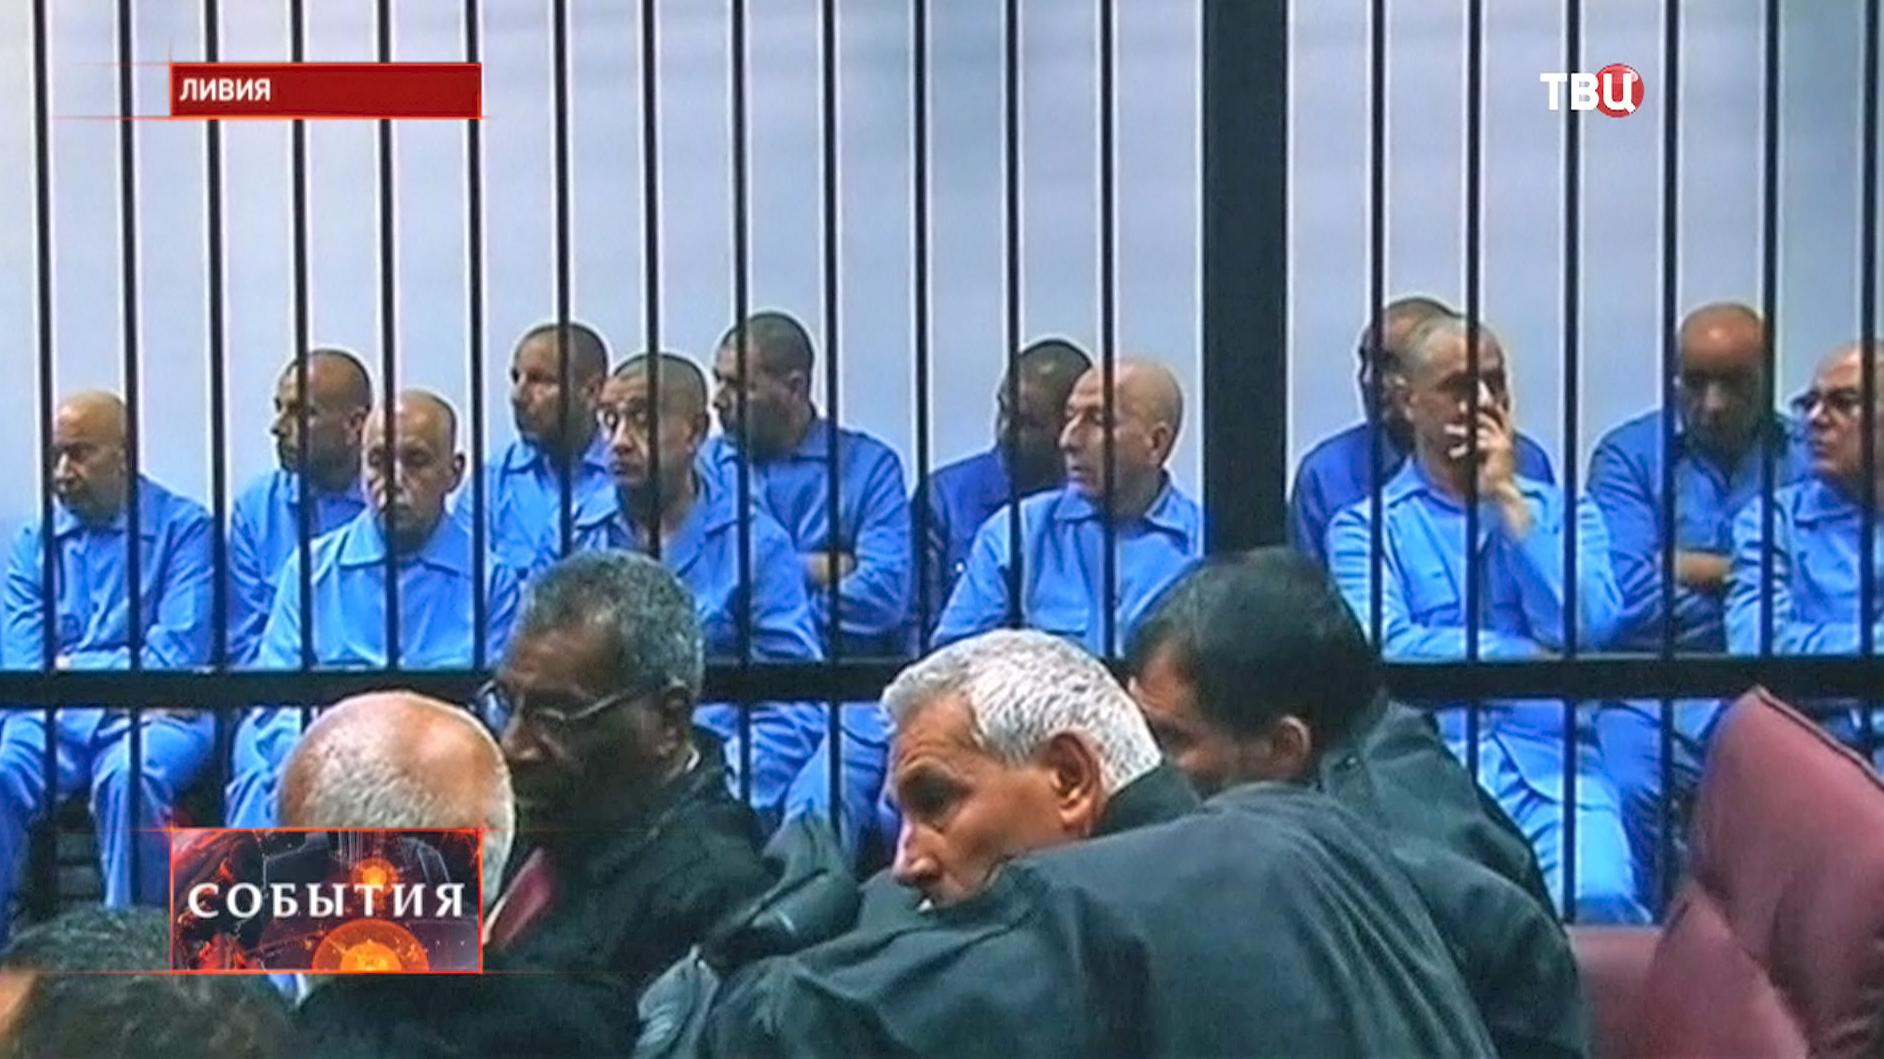 Судебный процесс над сыном Муаммара Каддафи